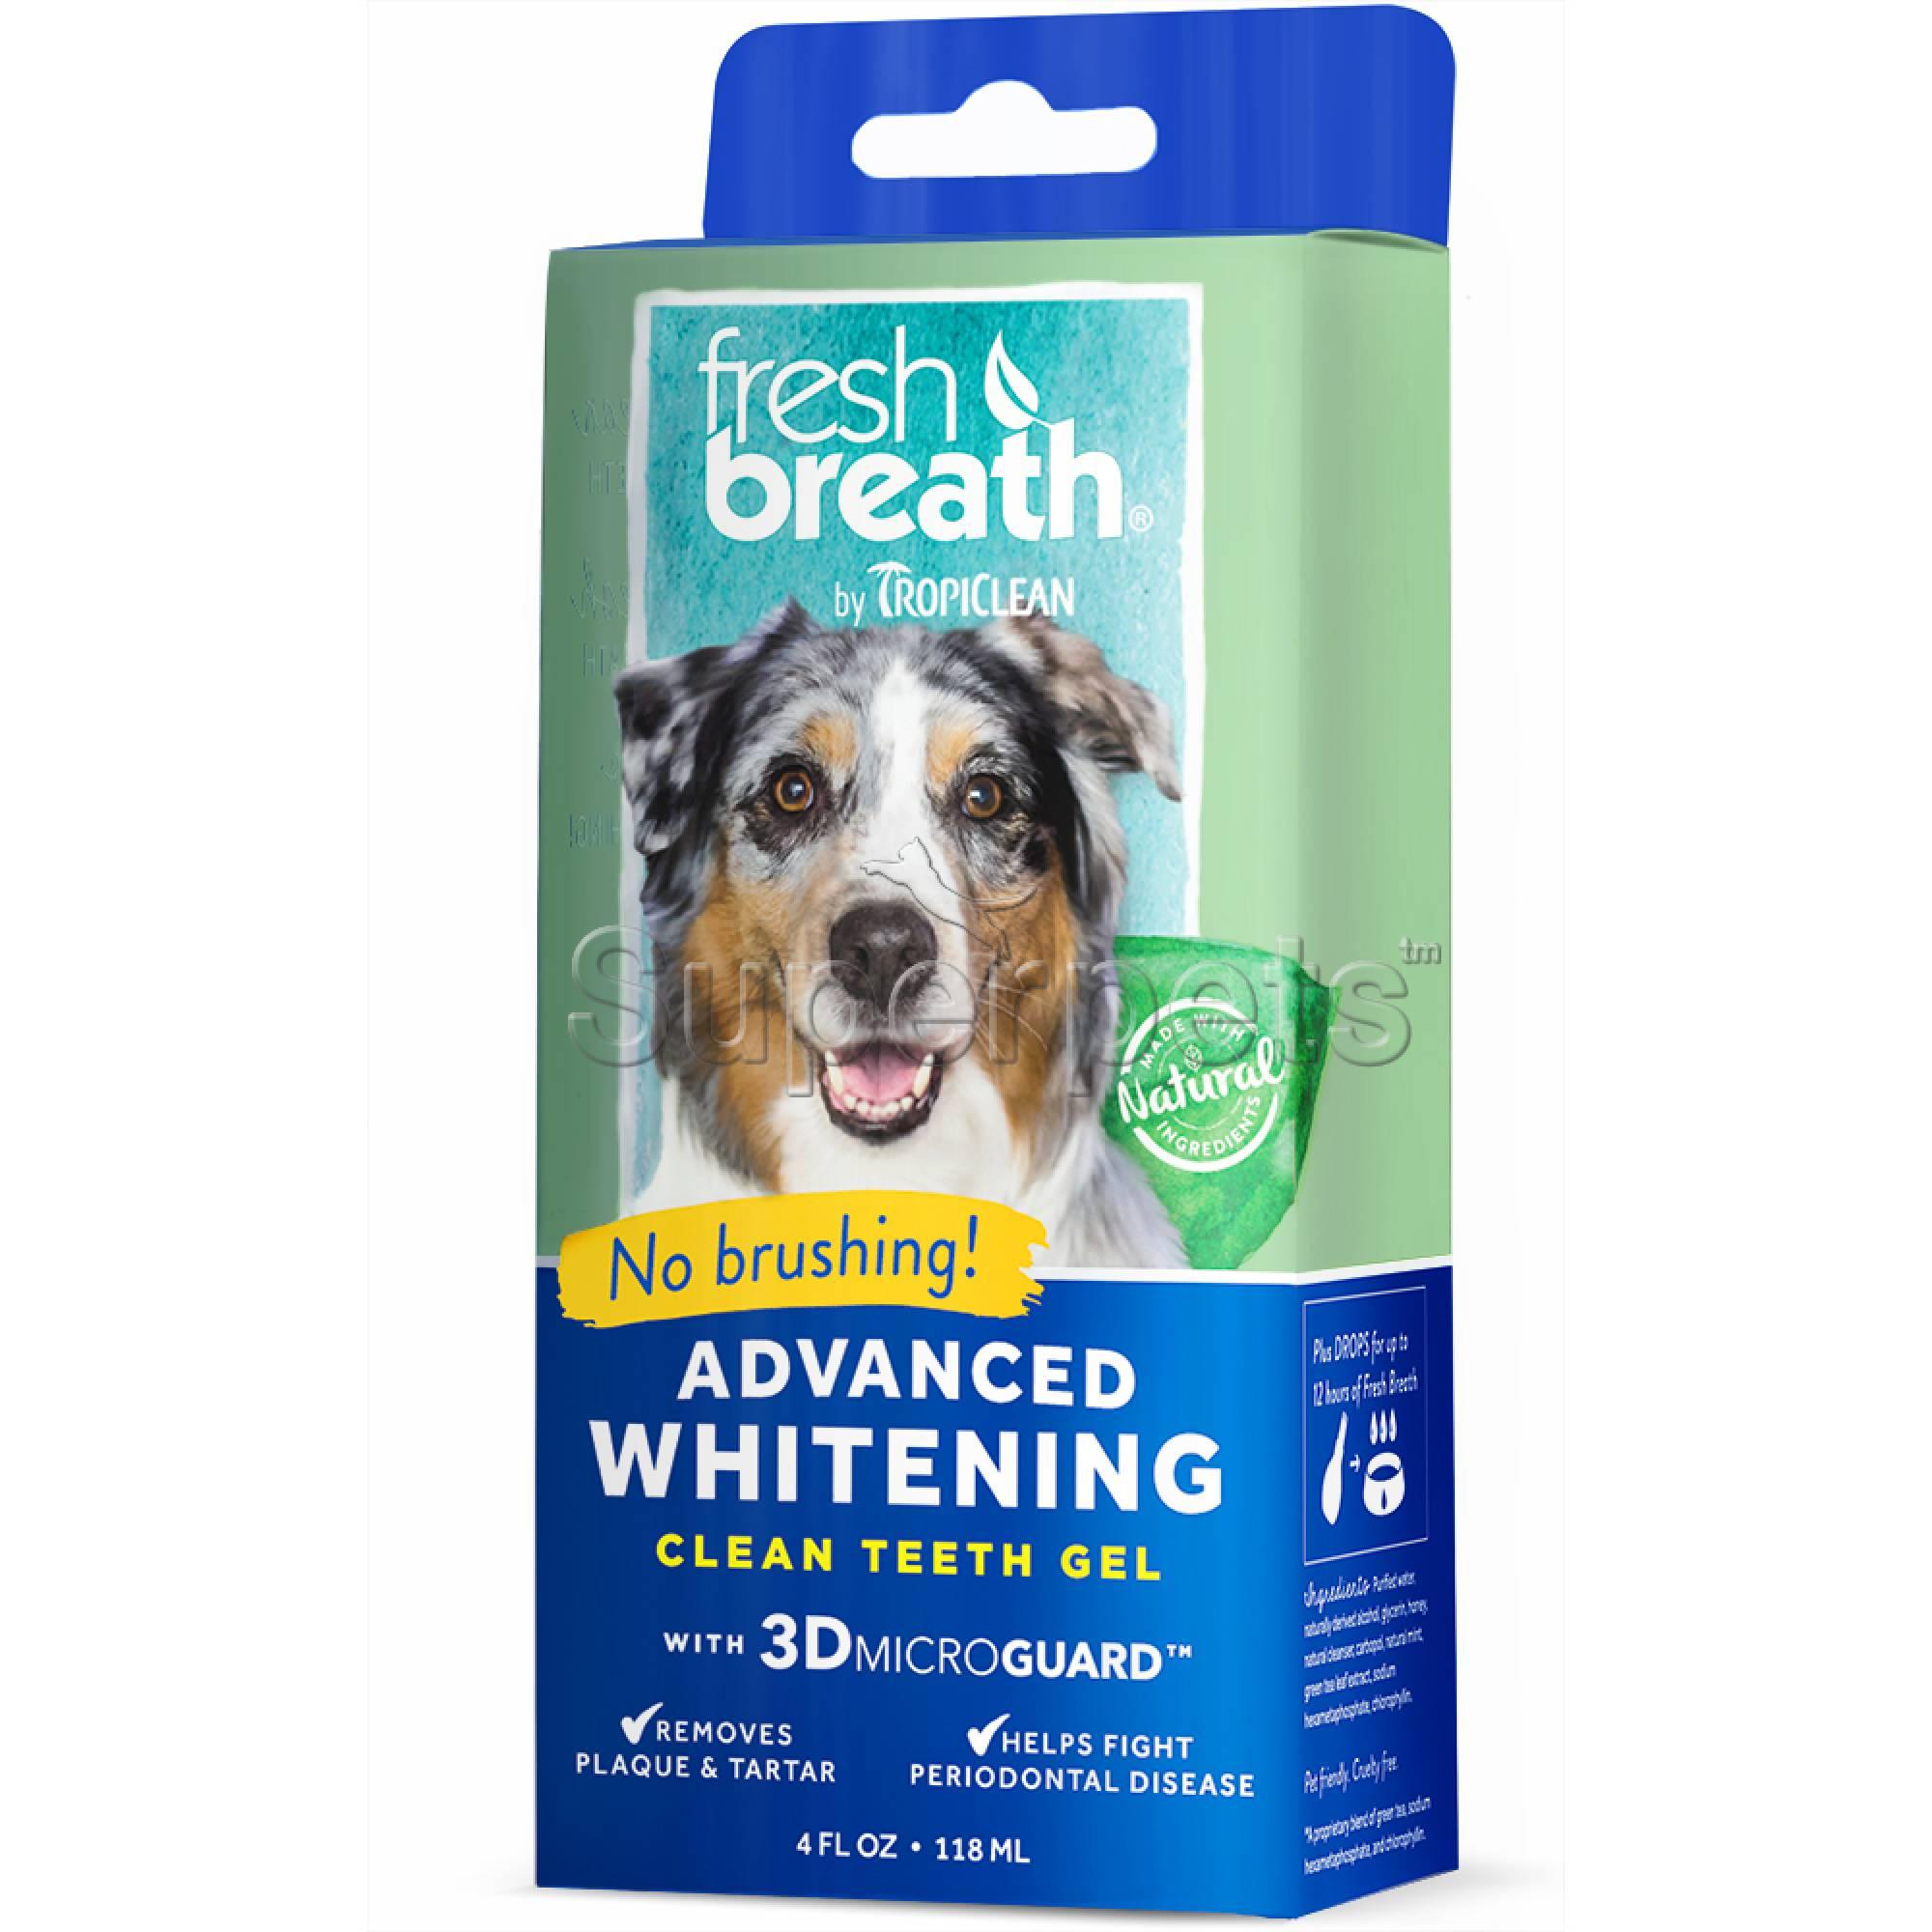 Tropiclean FRESH BREATH Advanced Whitening Clean Teeth Gel 4oz (118ml)